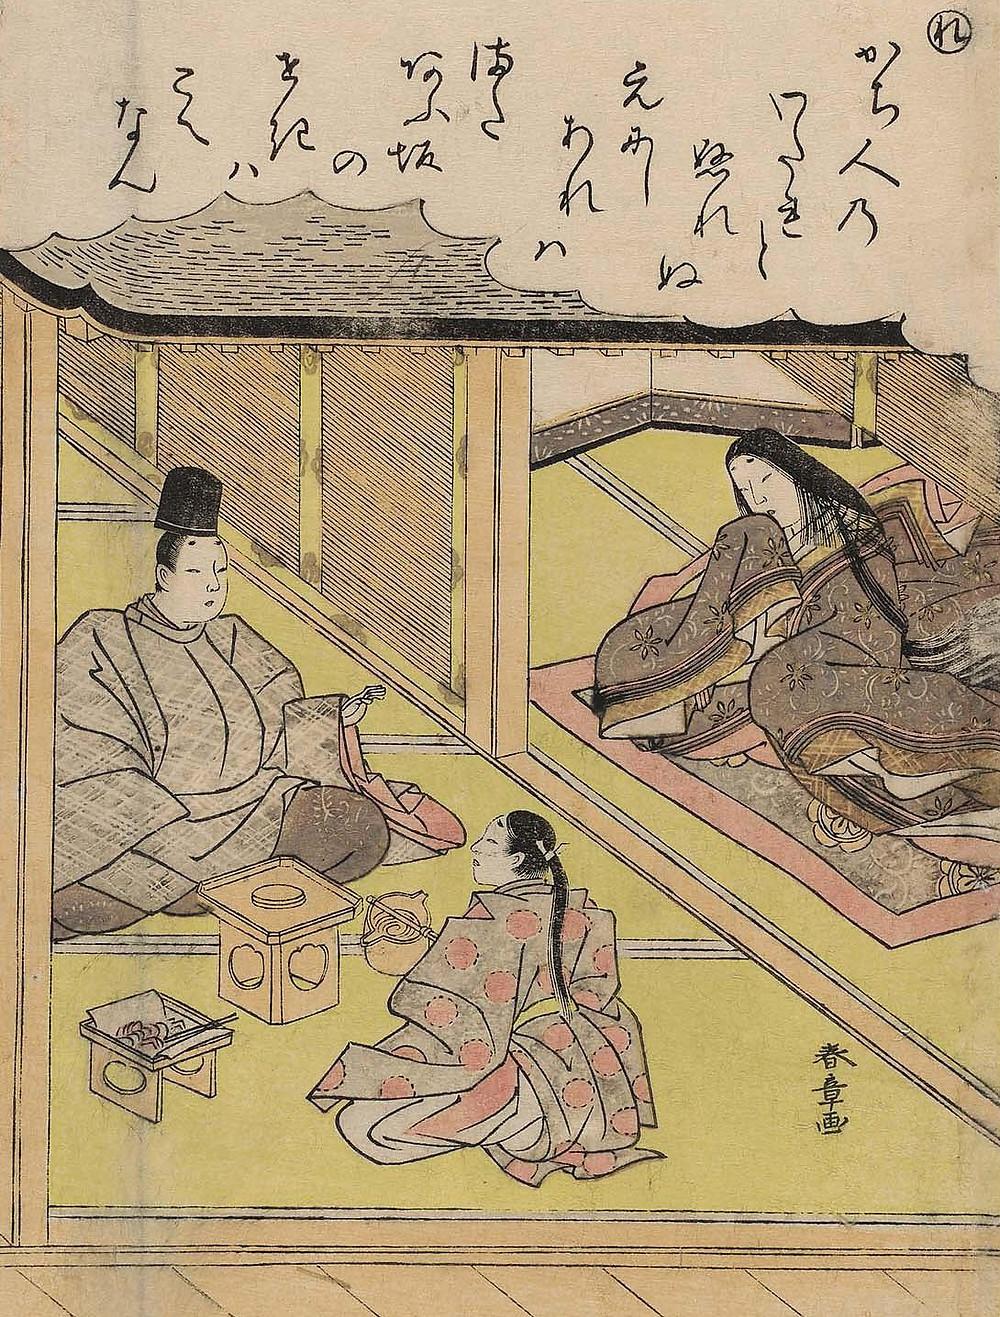 Ariwara no Narihira, Tales of Ise, Heian, Japanese literature, Zusetsu furoshiki, sake